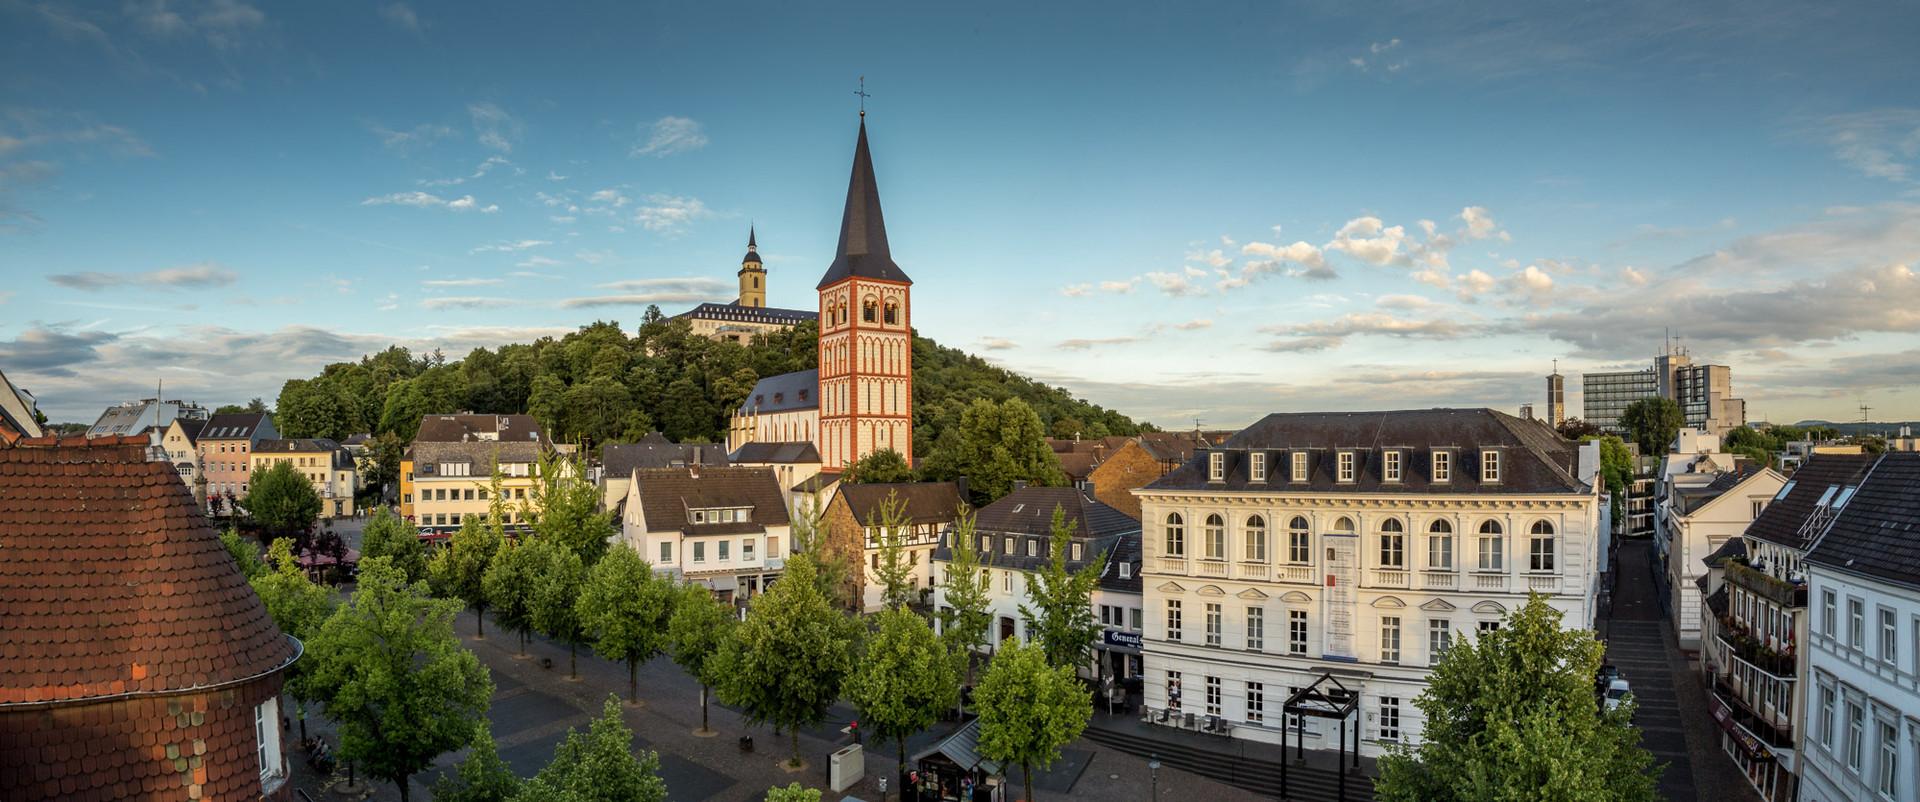 Marktplatz | Siegburg